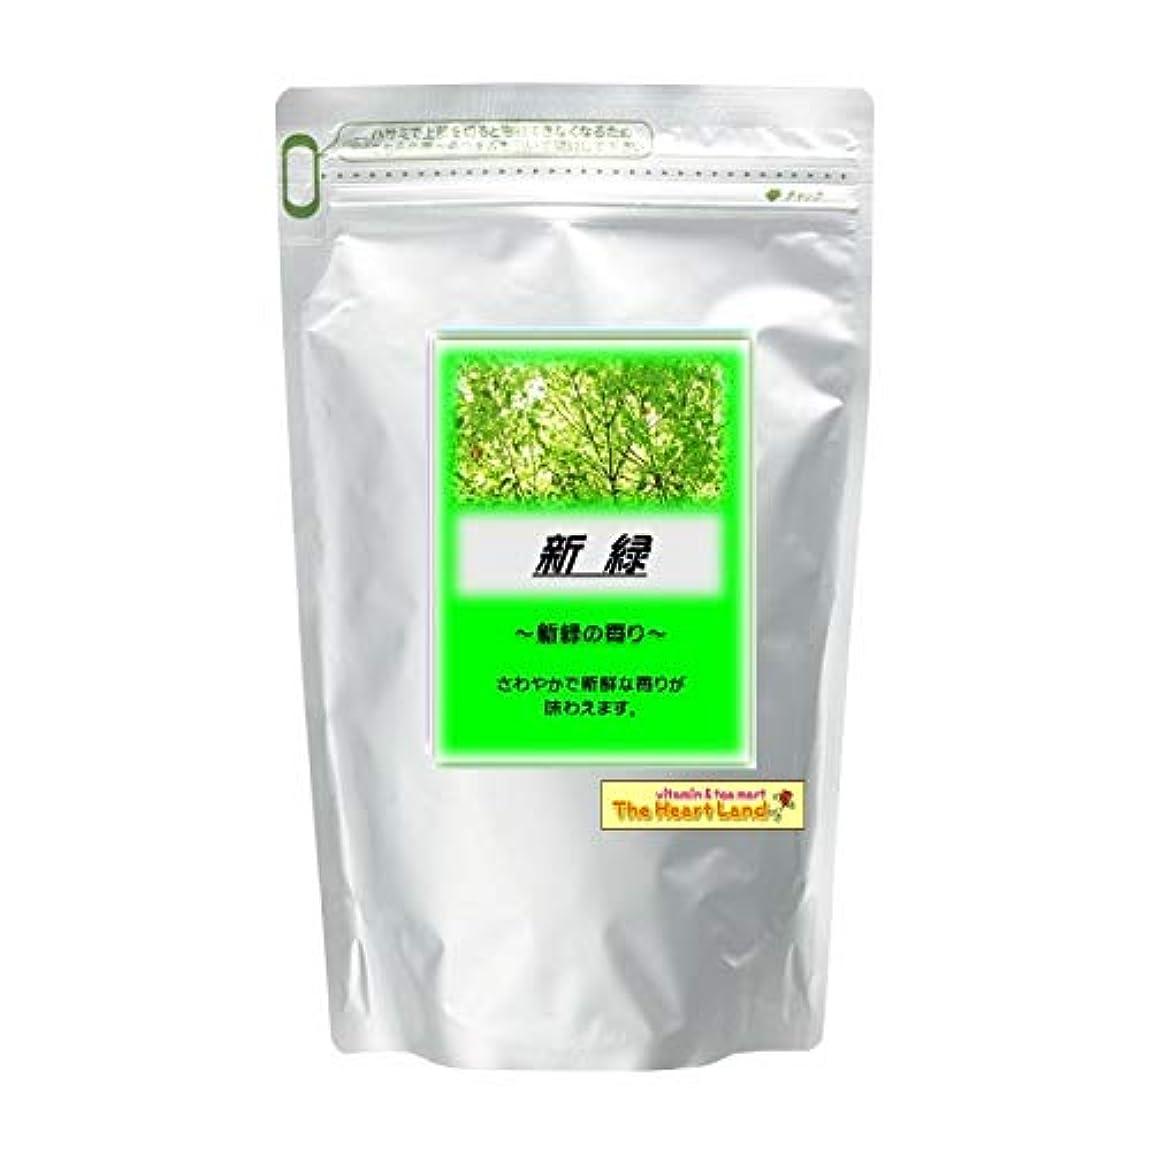 ジャズ哲学者狂気アサヒ入浴剤 浴用入浴化粧品 新緑 300g